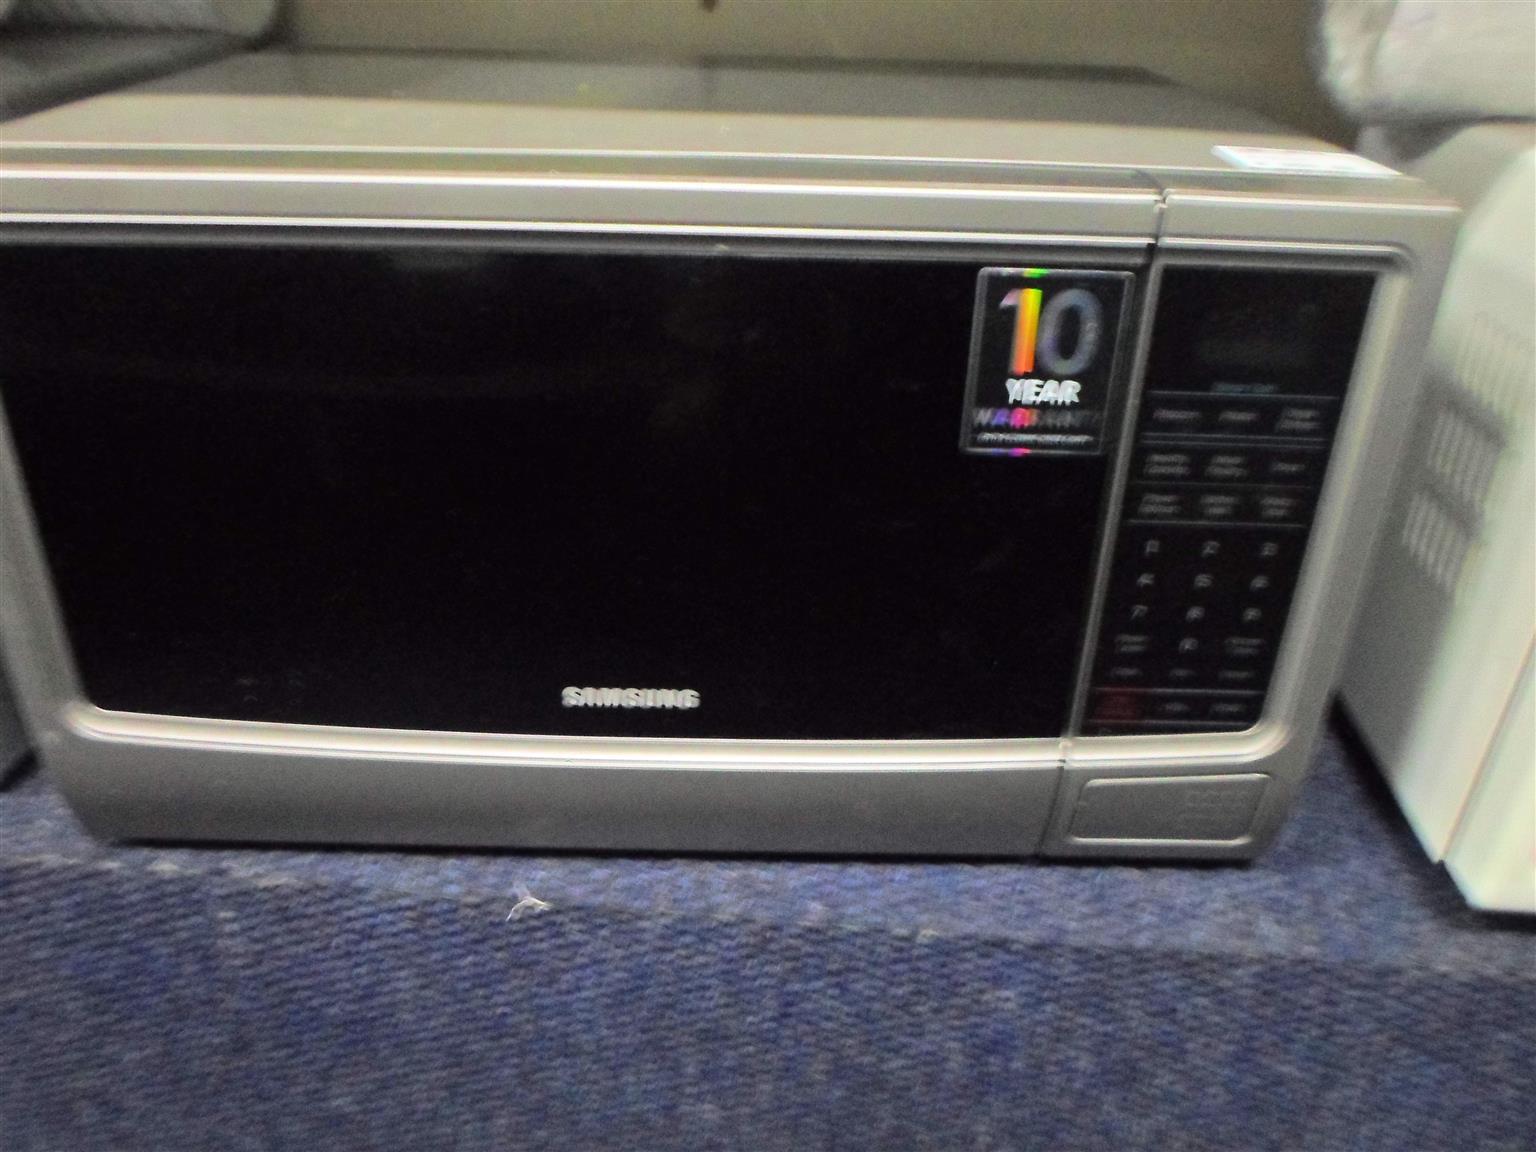 Samsung ME9114S1 Microwave